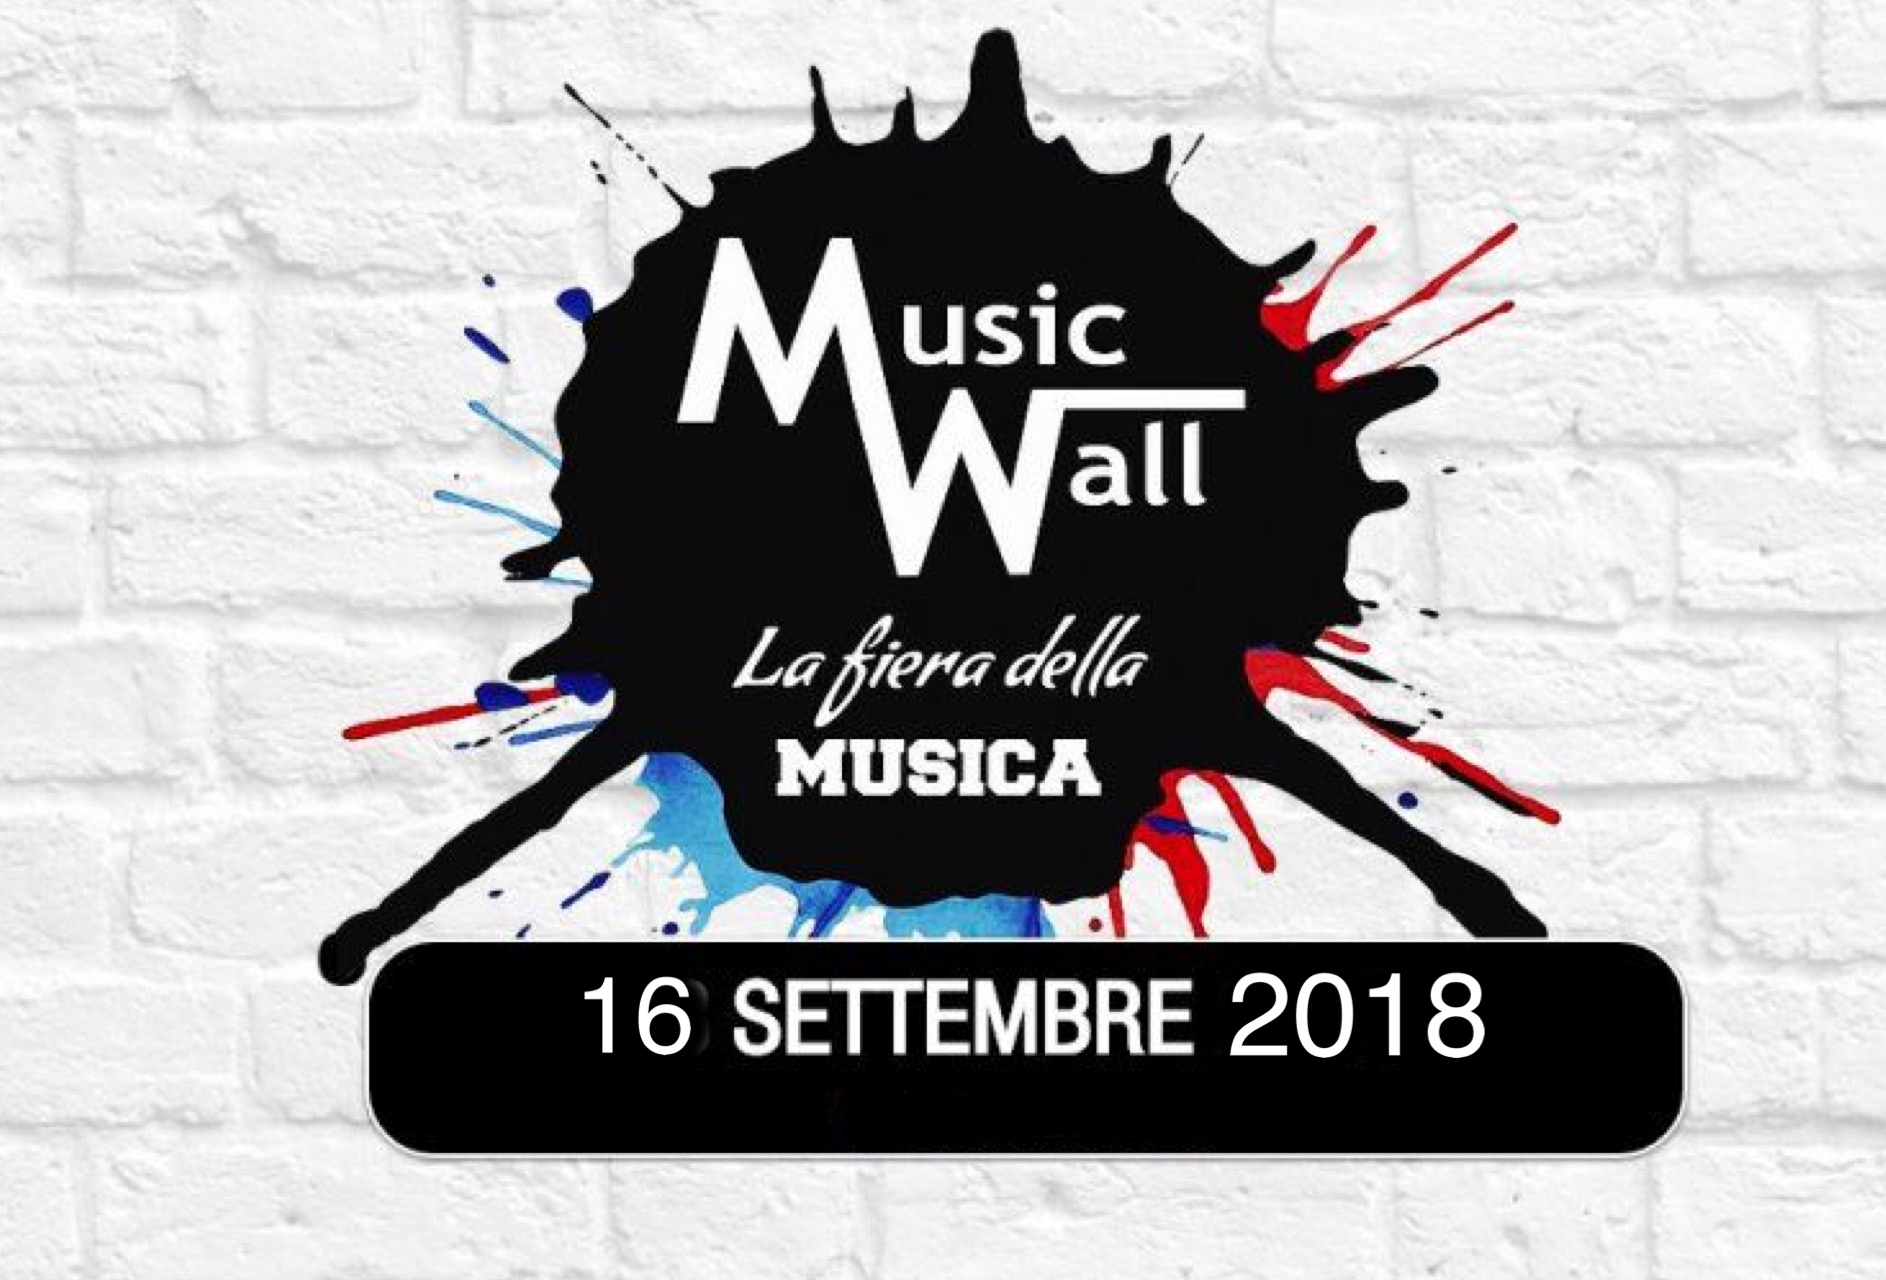 music wall 2018